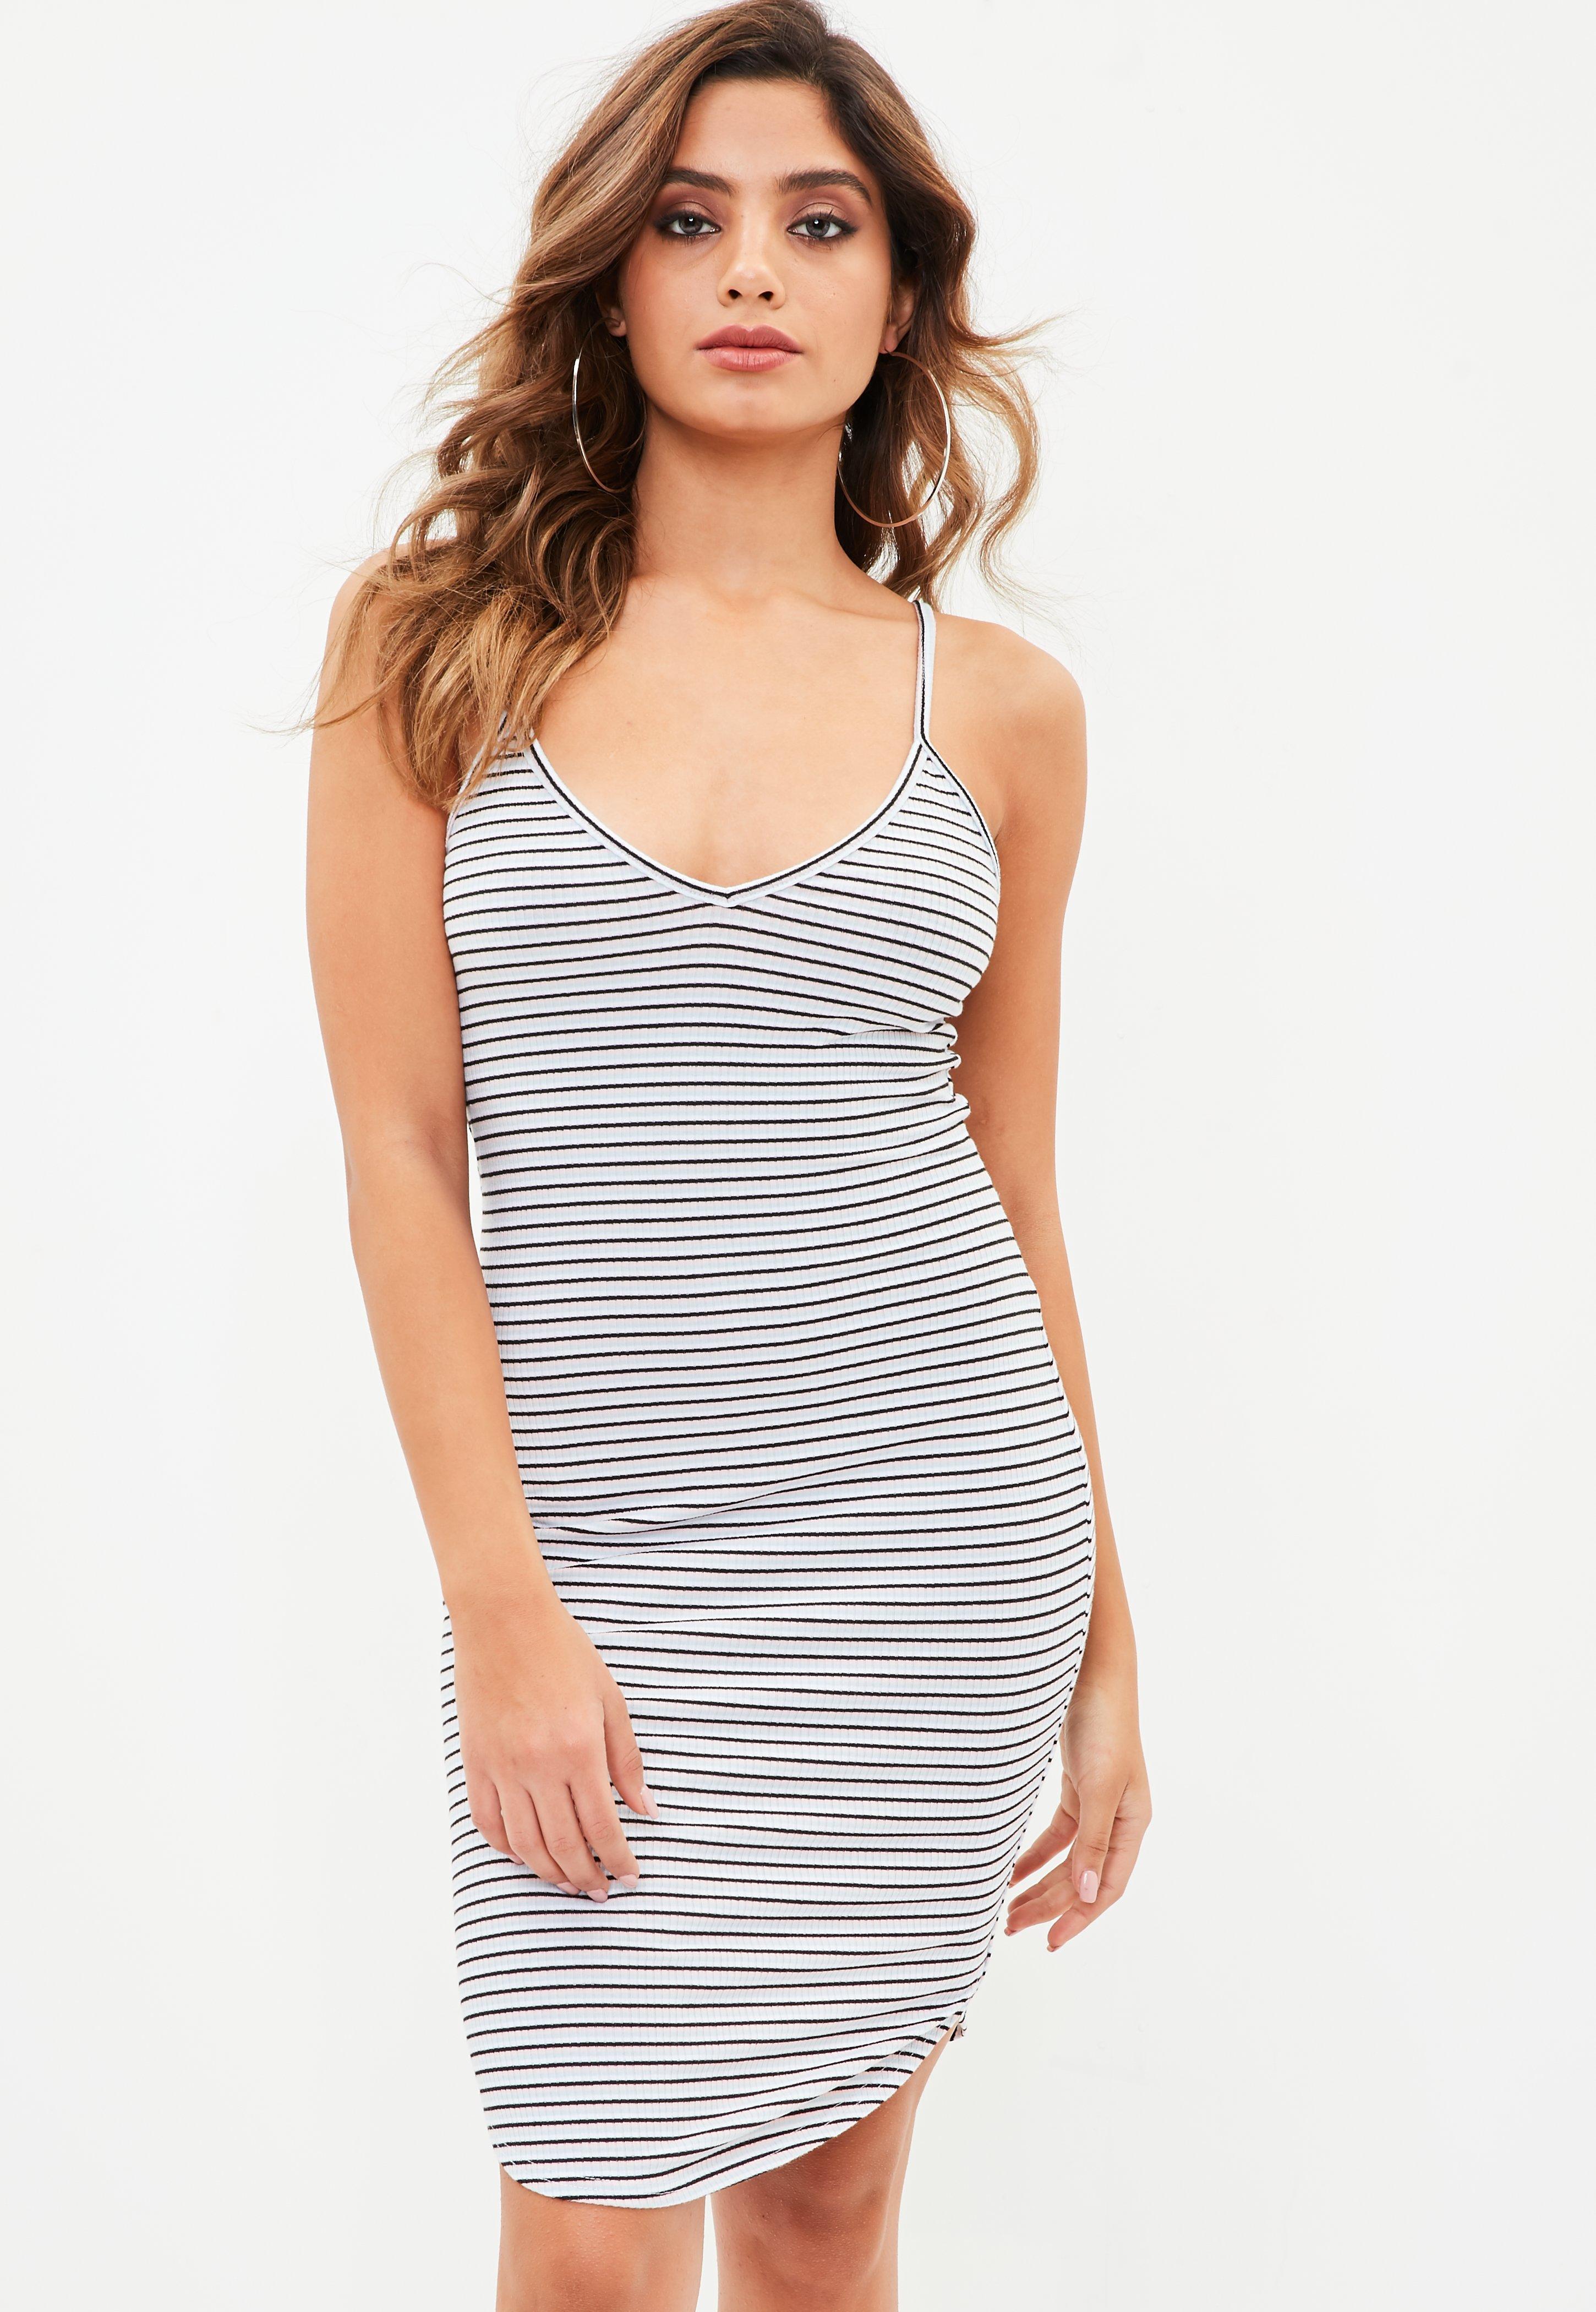 White mini dress with silver cage strap back